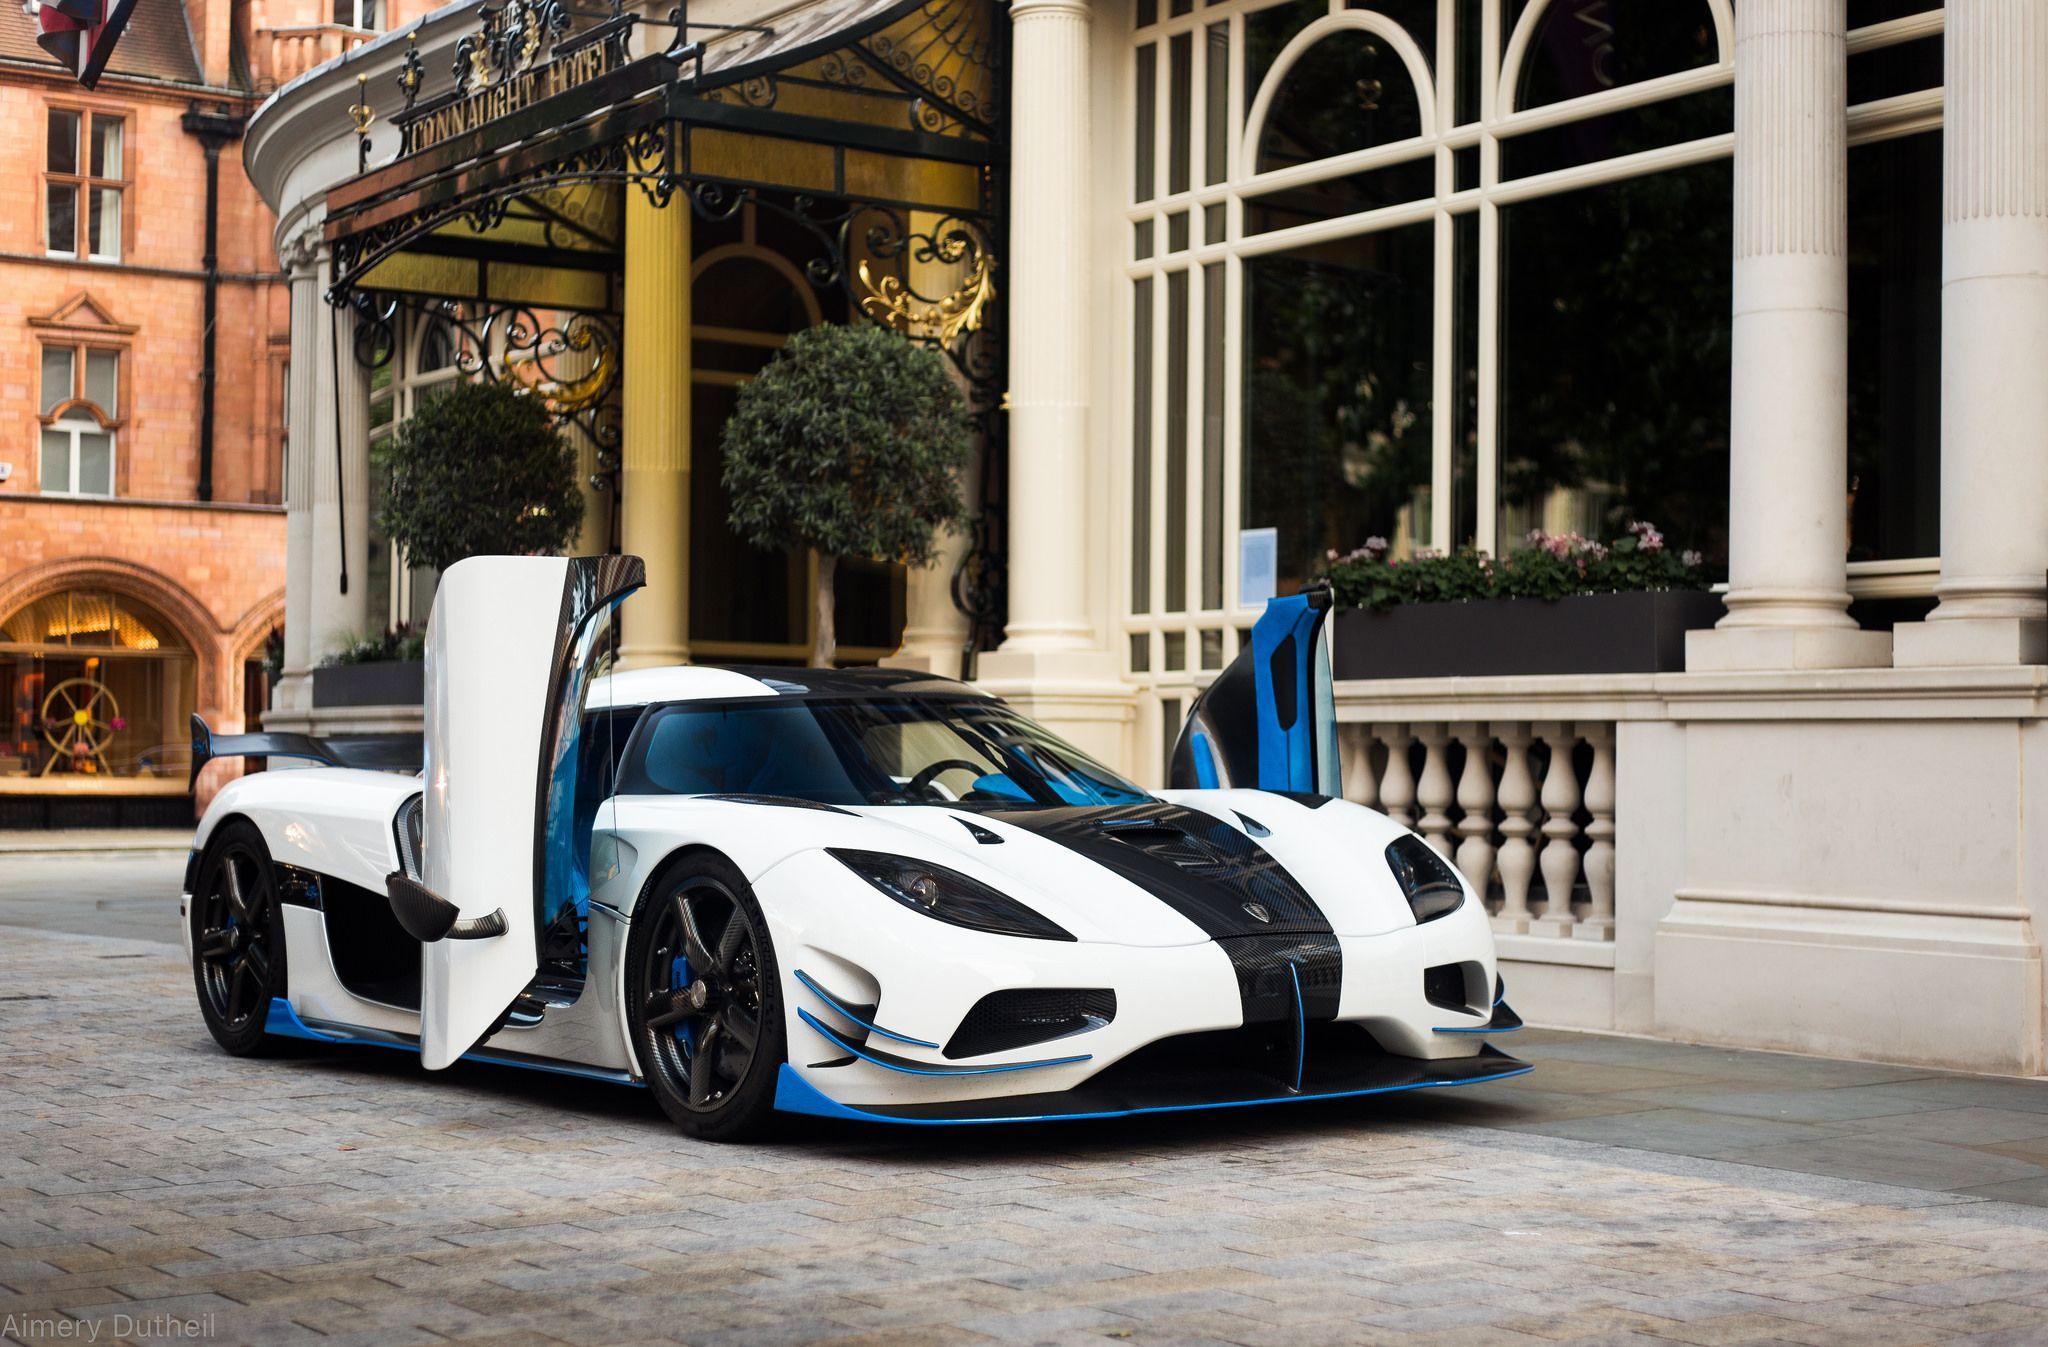 Dihedral doors | Koenigsegg, Latest cars, Super cars